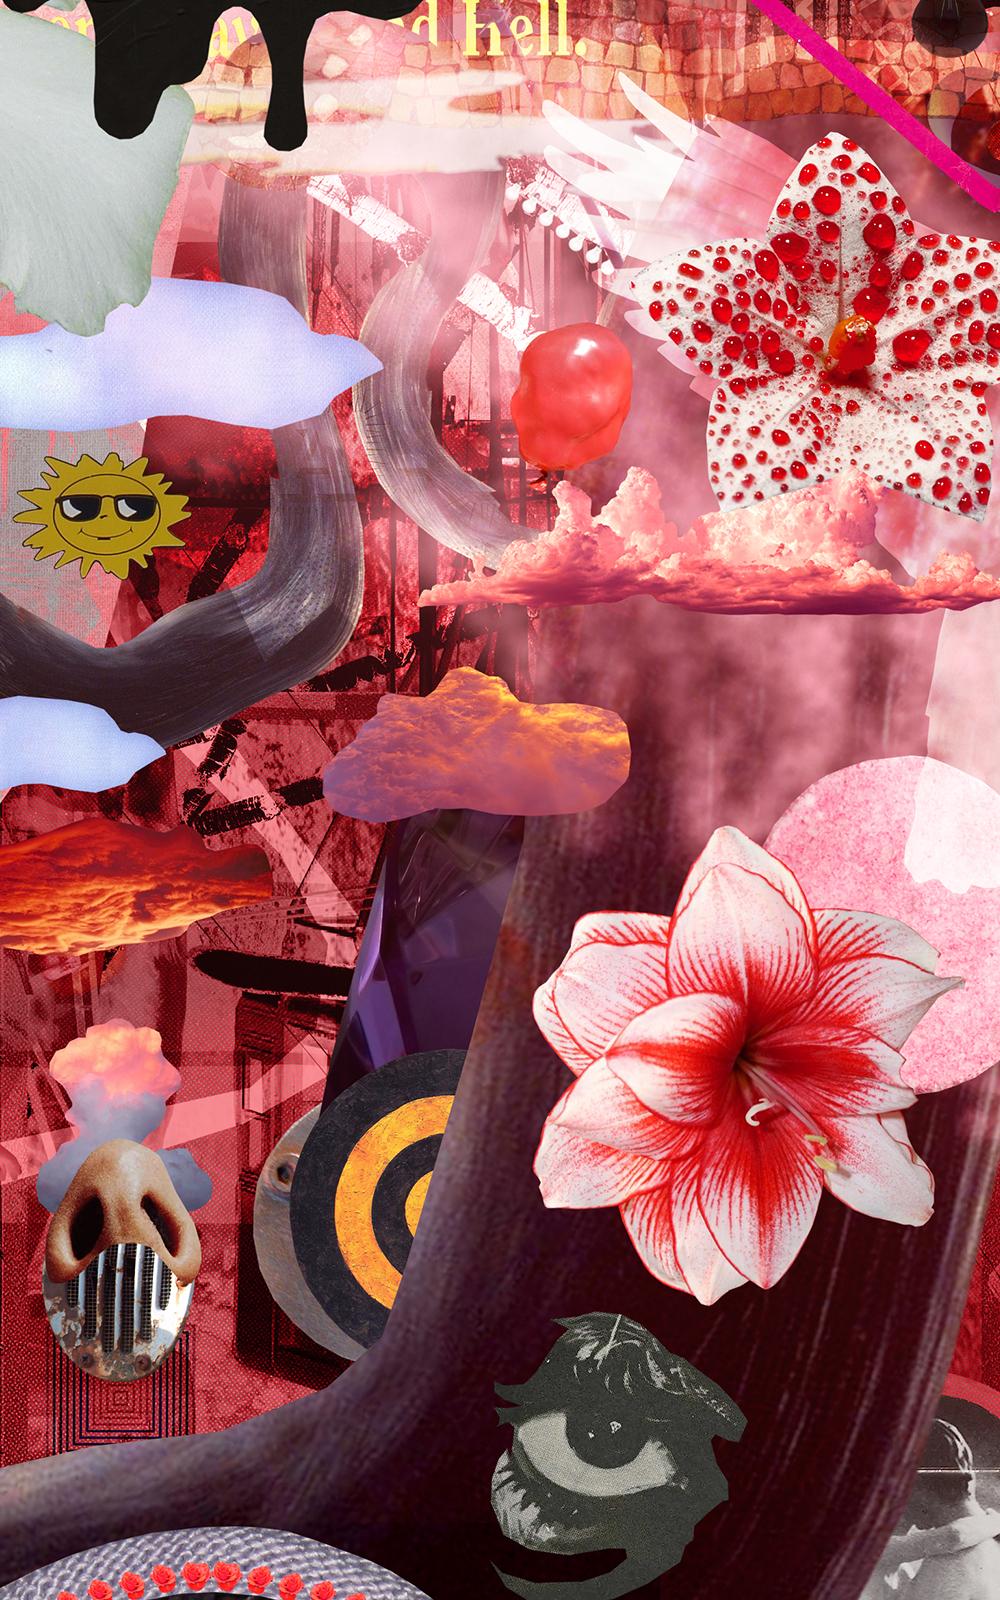 Case Simmons, Simmons & Burke, If Not Summer #3, Kohn Gallery, Hieronymus Bosch, Lightjet Print, Digital Collage,Digital Art, Photoshop Collage, Contemporary Collage,Case Simmons Art, Case Simmons Artist, Collage Fine Art, Hyper Collage, Future Collage,Digital Landscape